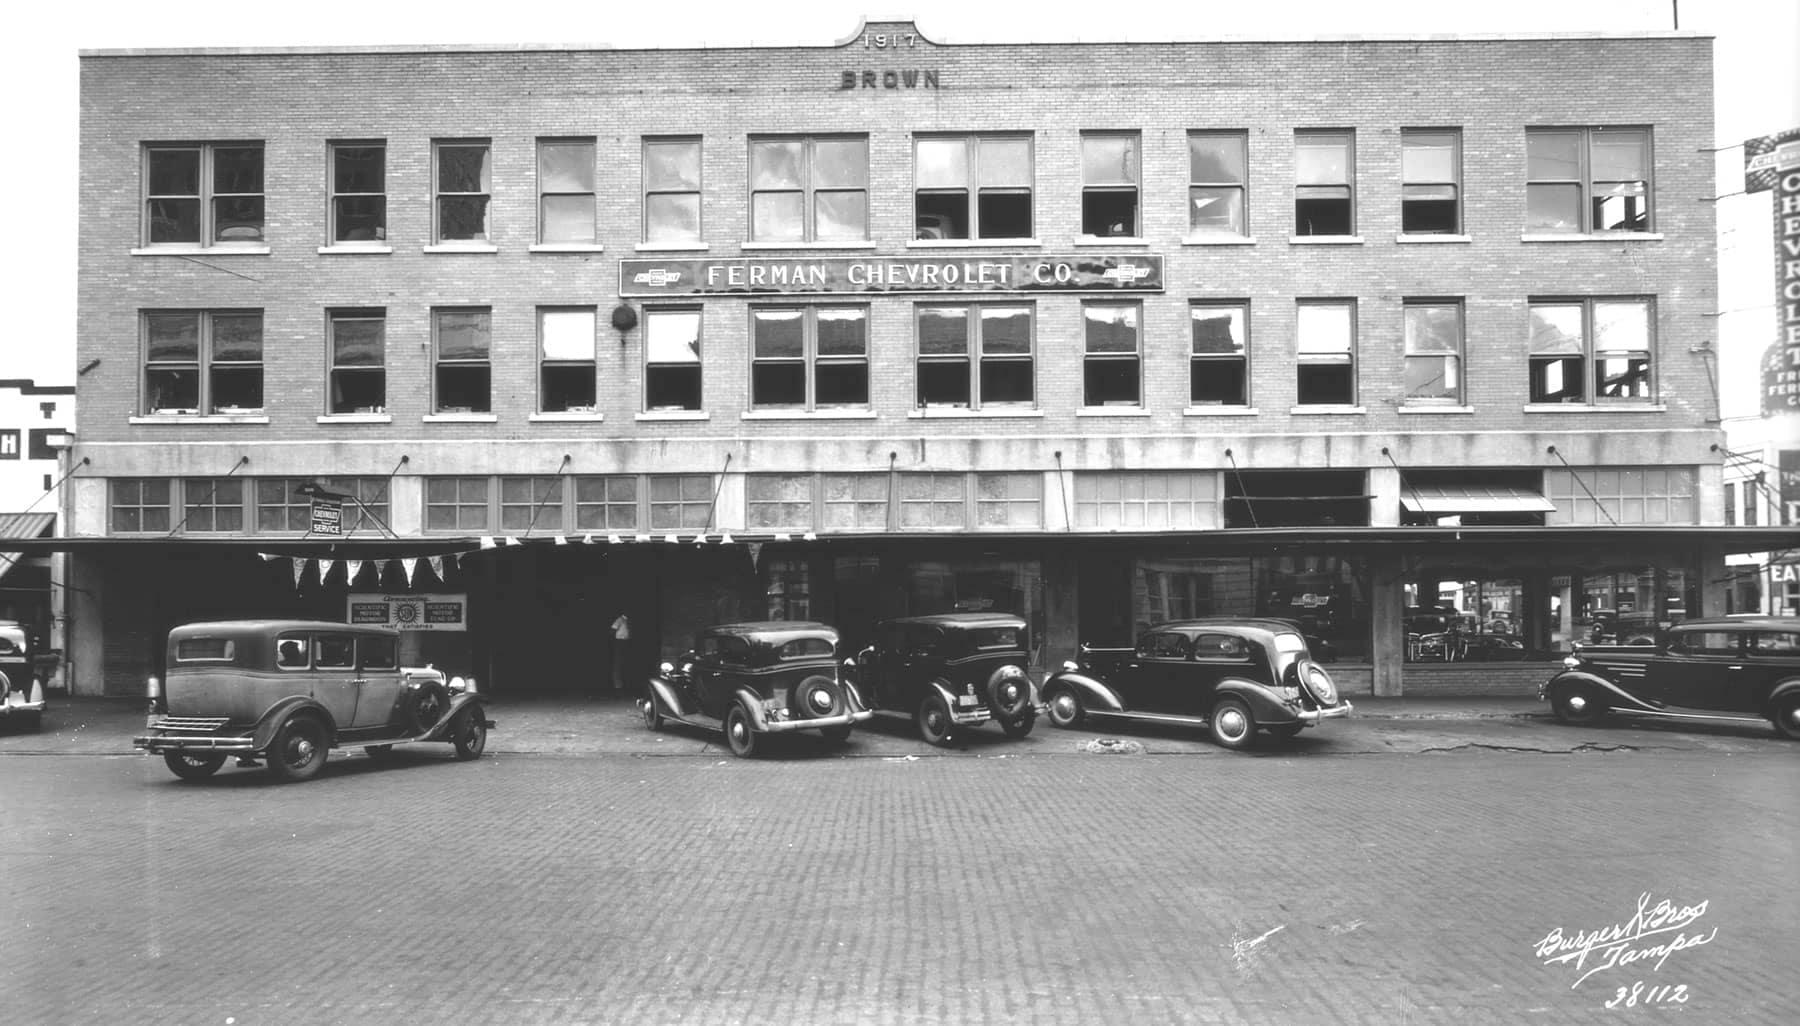 Exterior of Ferman Chevrolet of Tampa